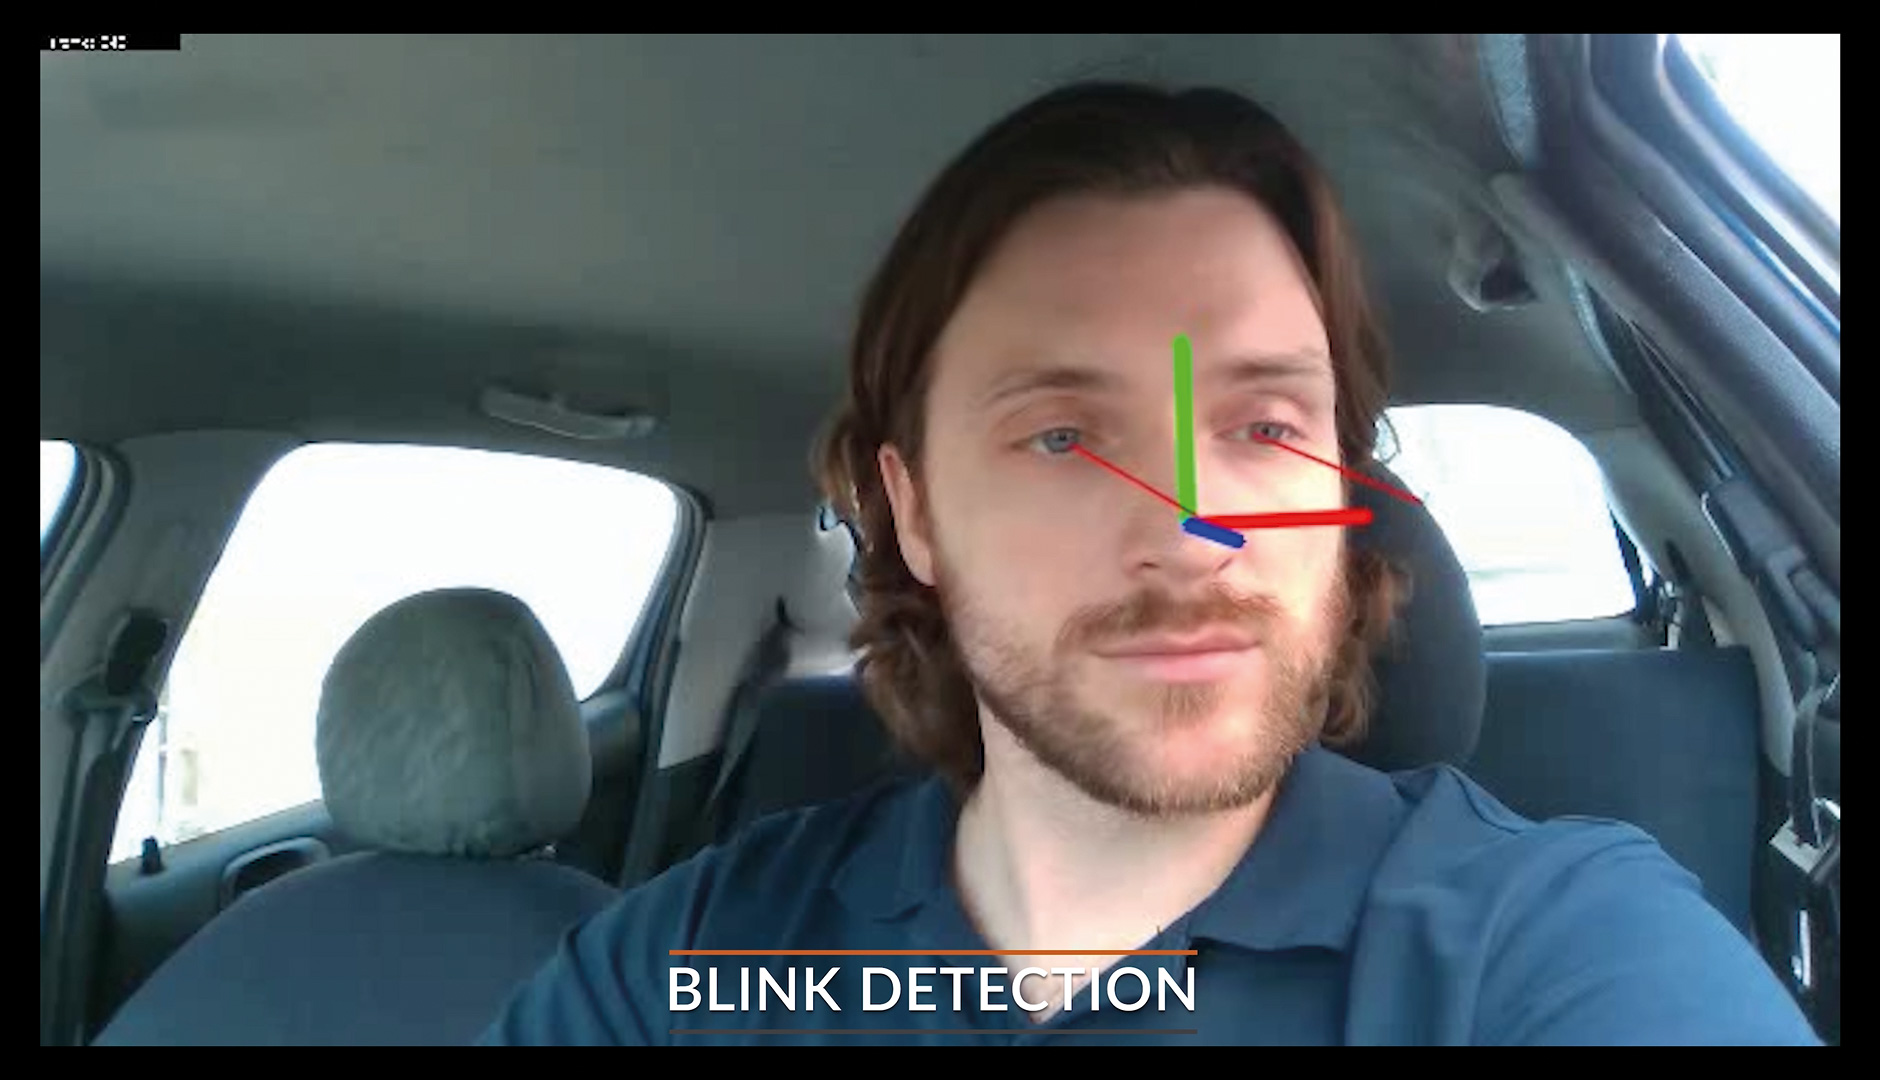 Eye tracking software